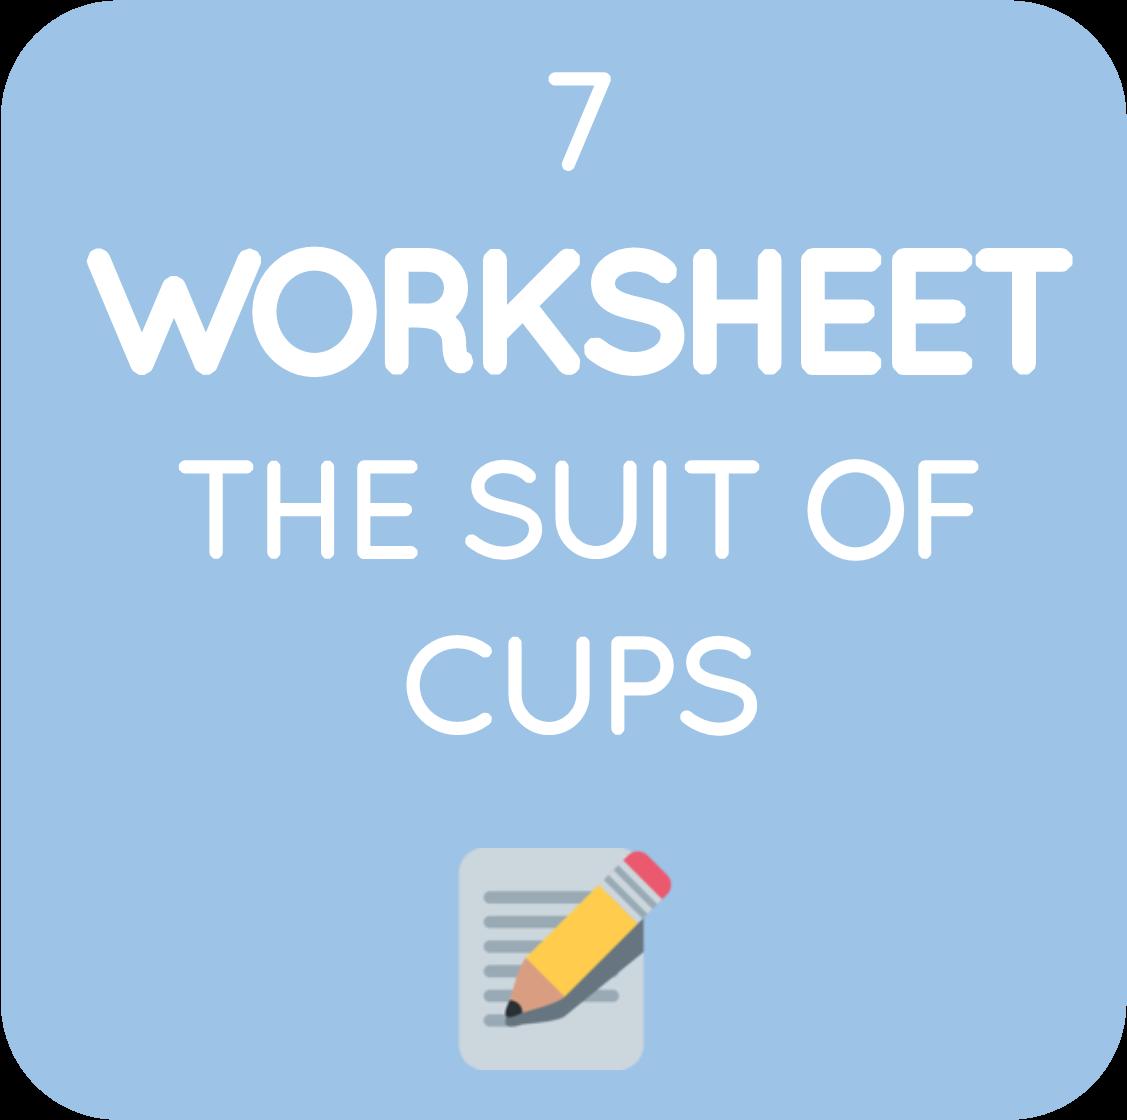 13-tarot worksheet #7.png